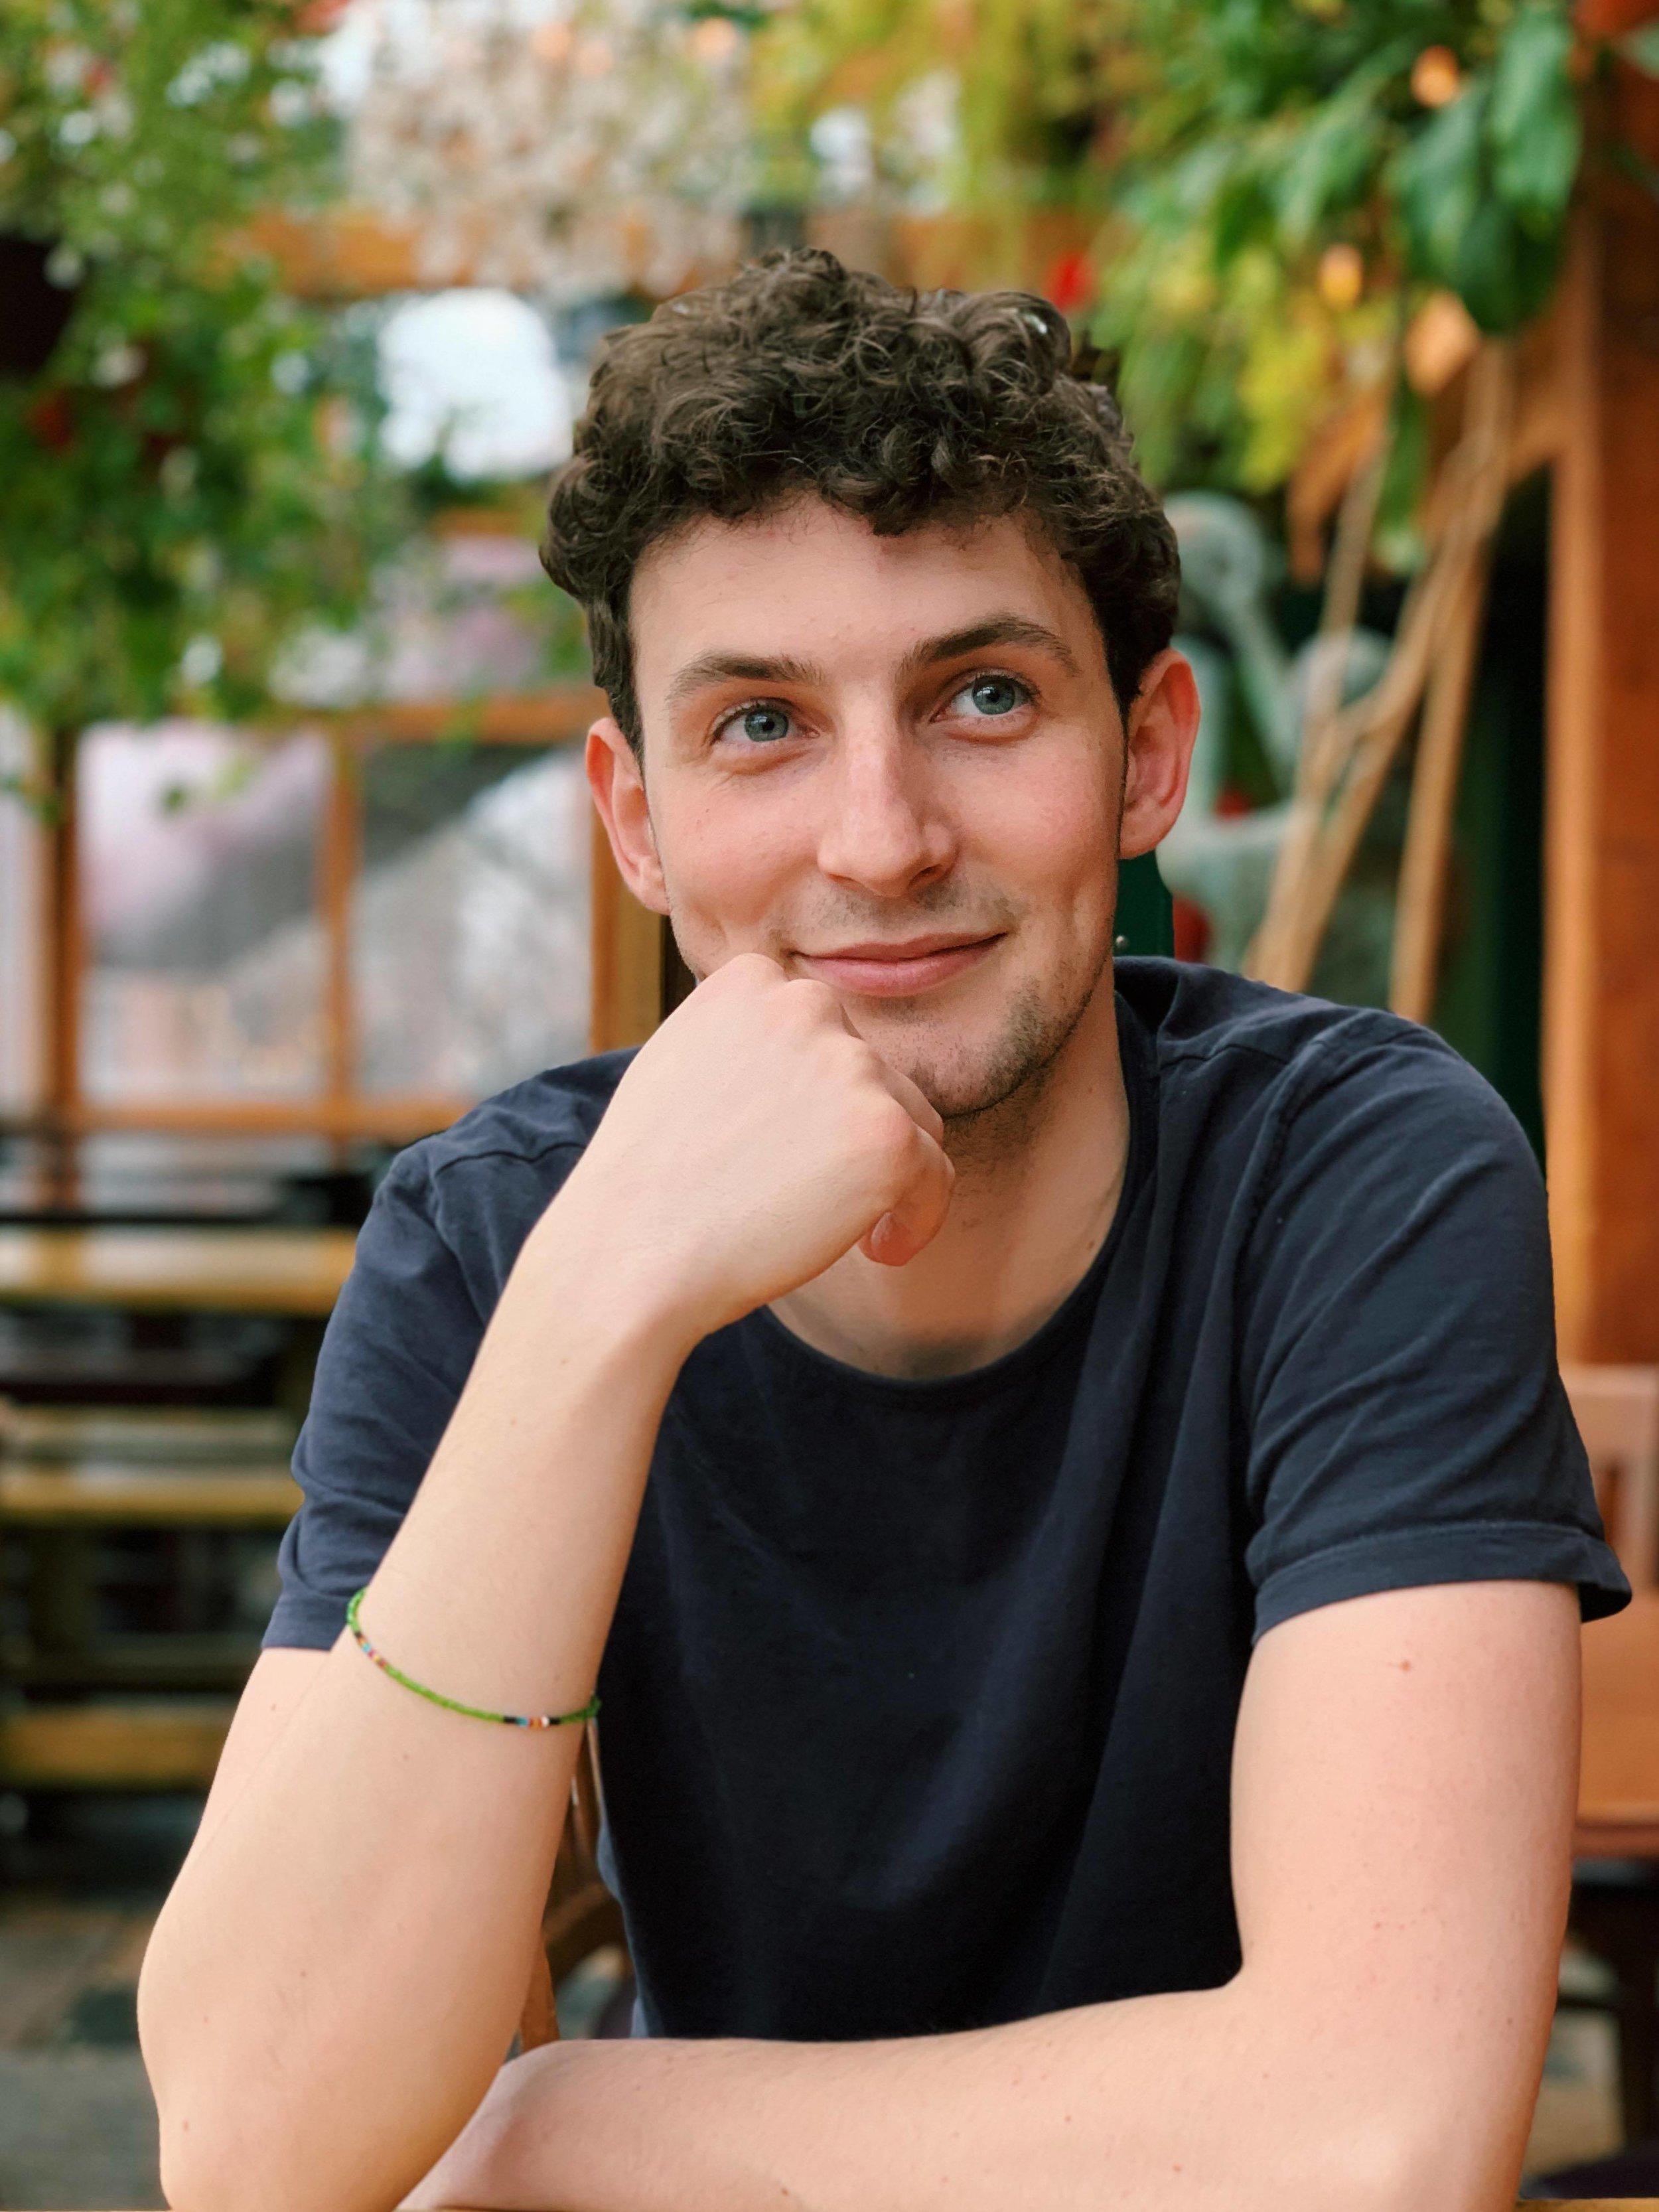 Isaac Greenberg